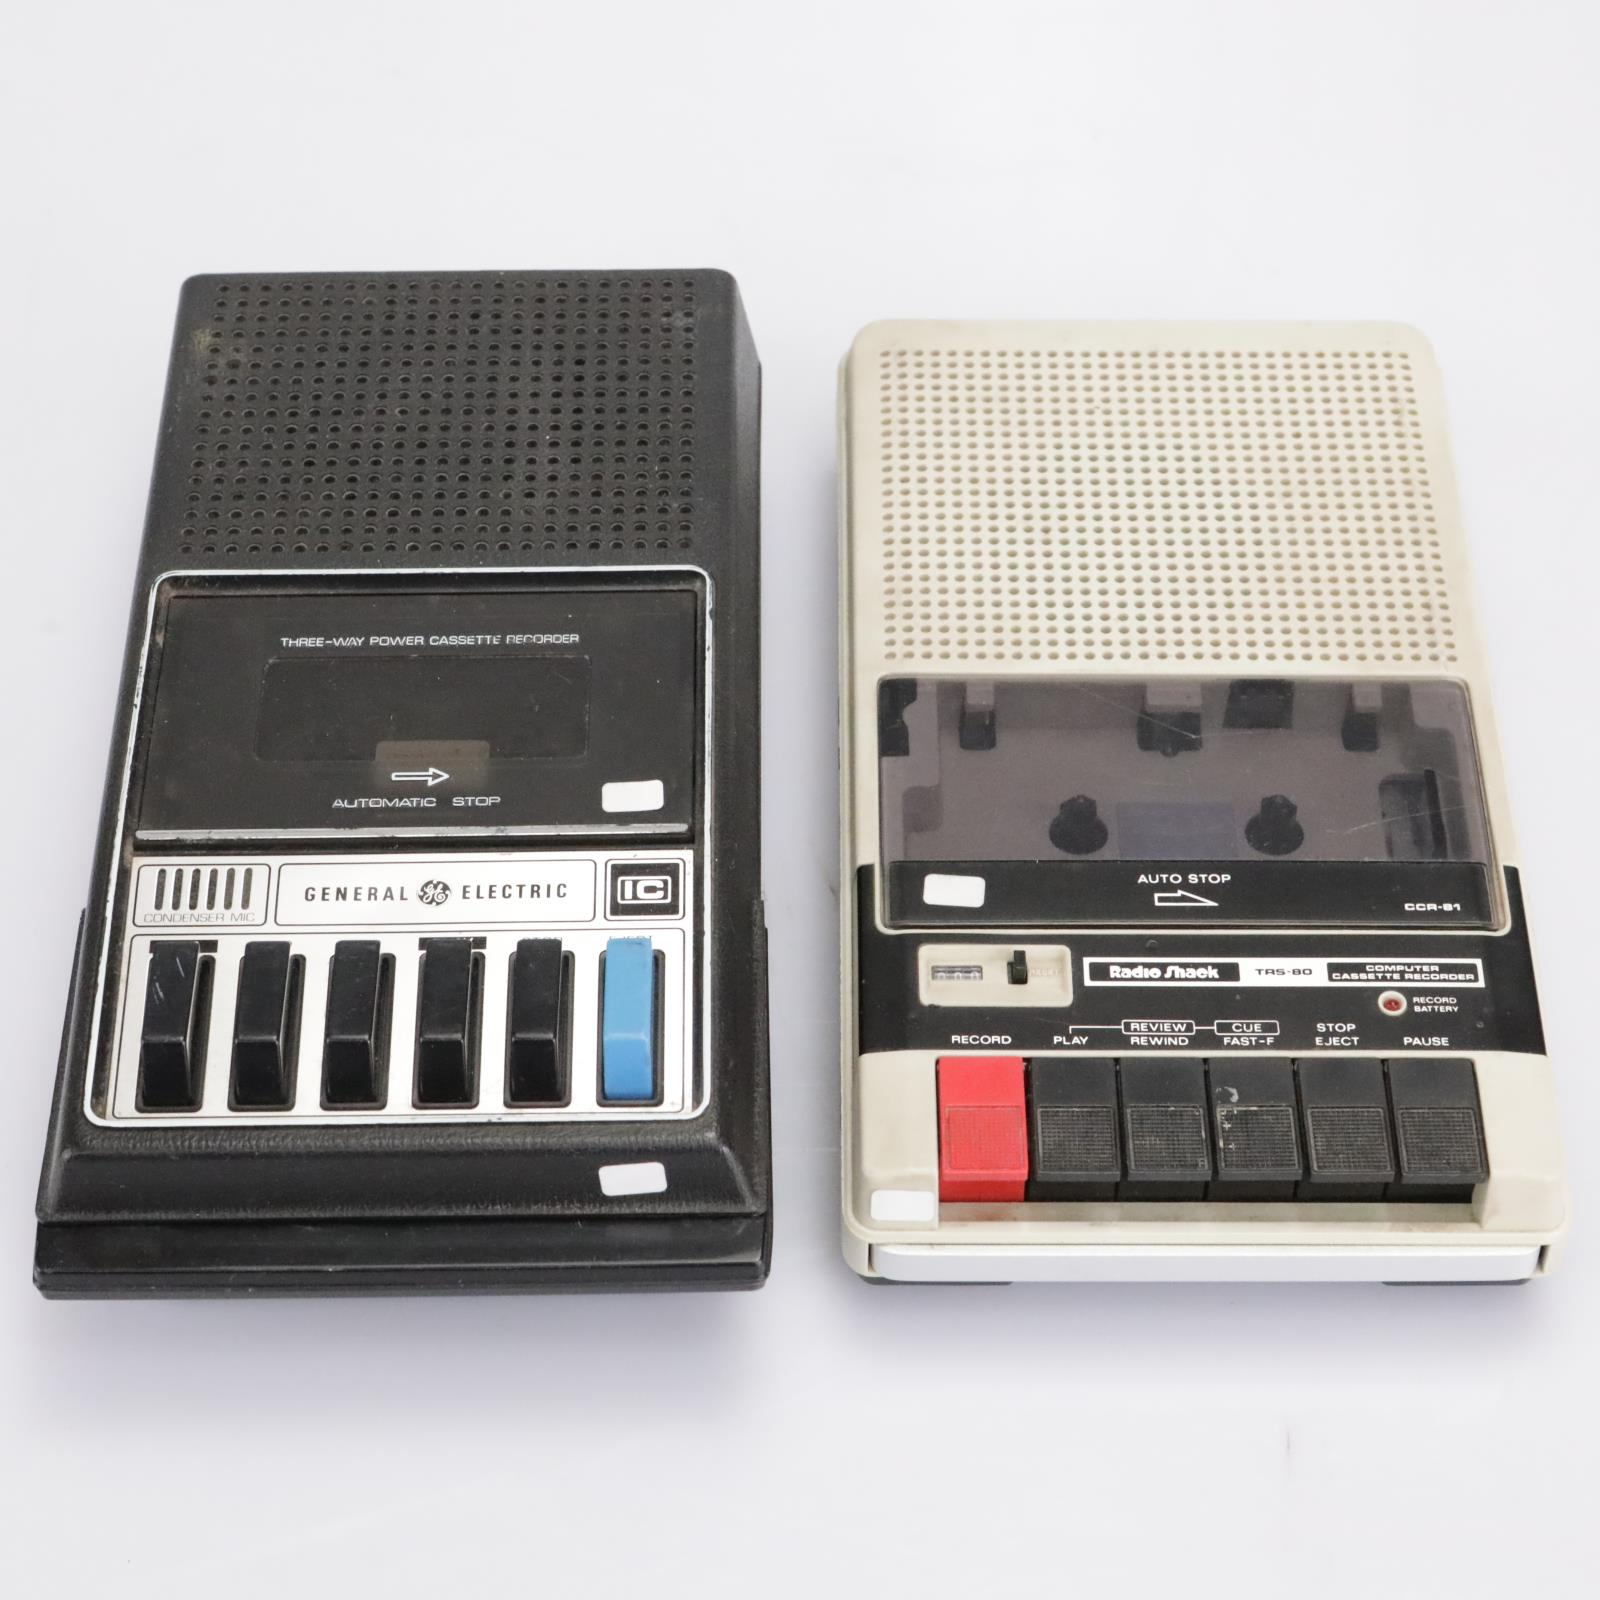 GE M8445B & Radio Shack CCR-81 Vintage Portable Cassette Tape Recorders #42783